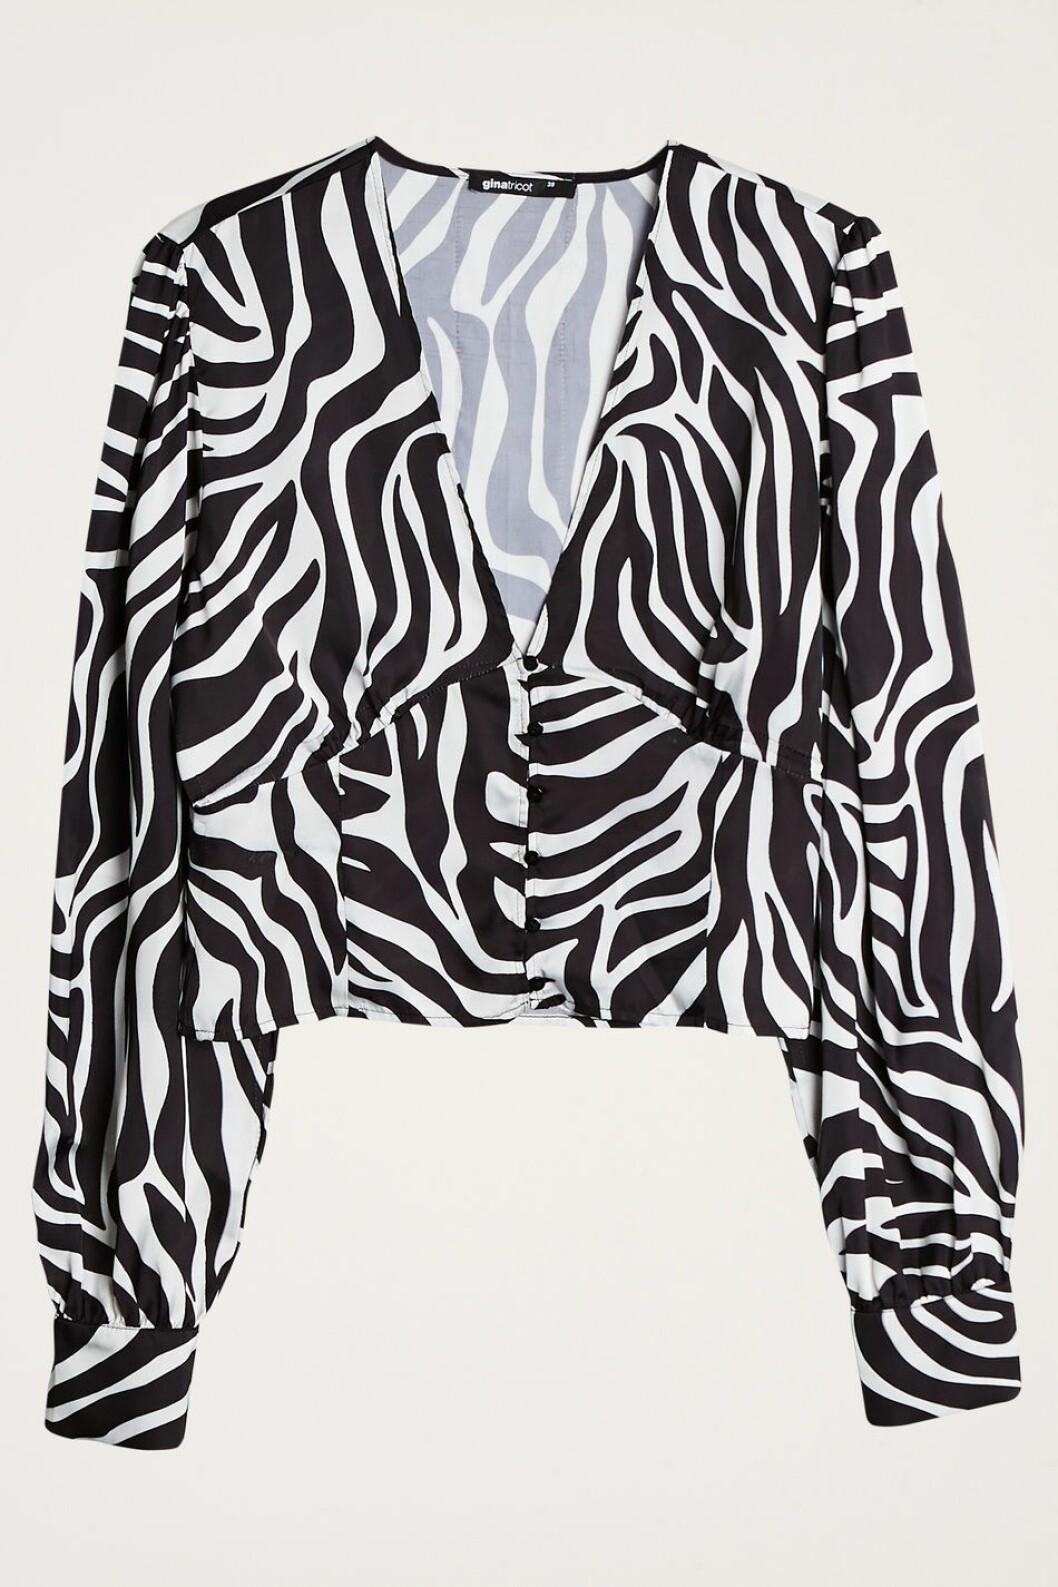 Blus med zebra-print från Gina tricot